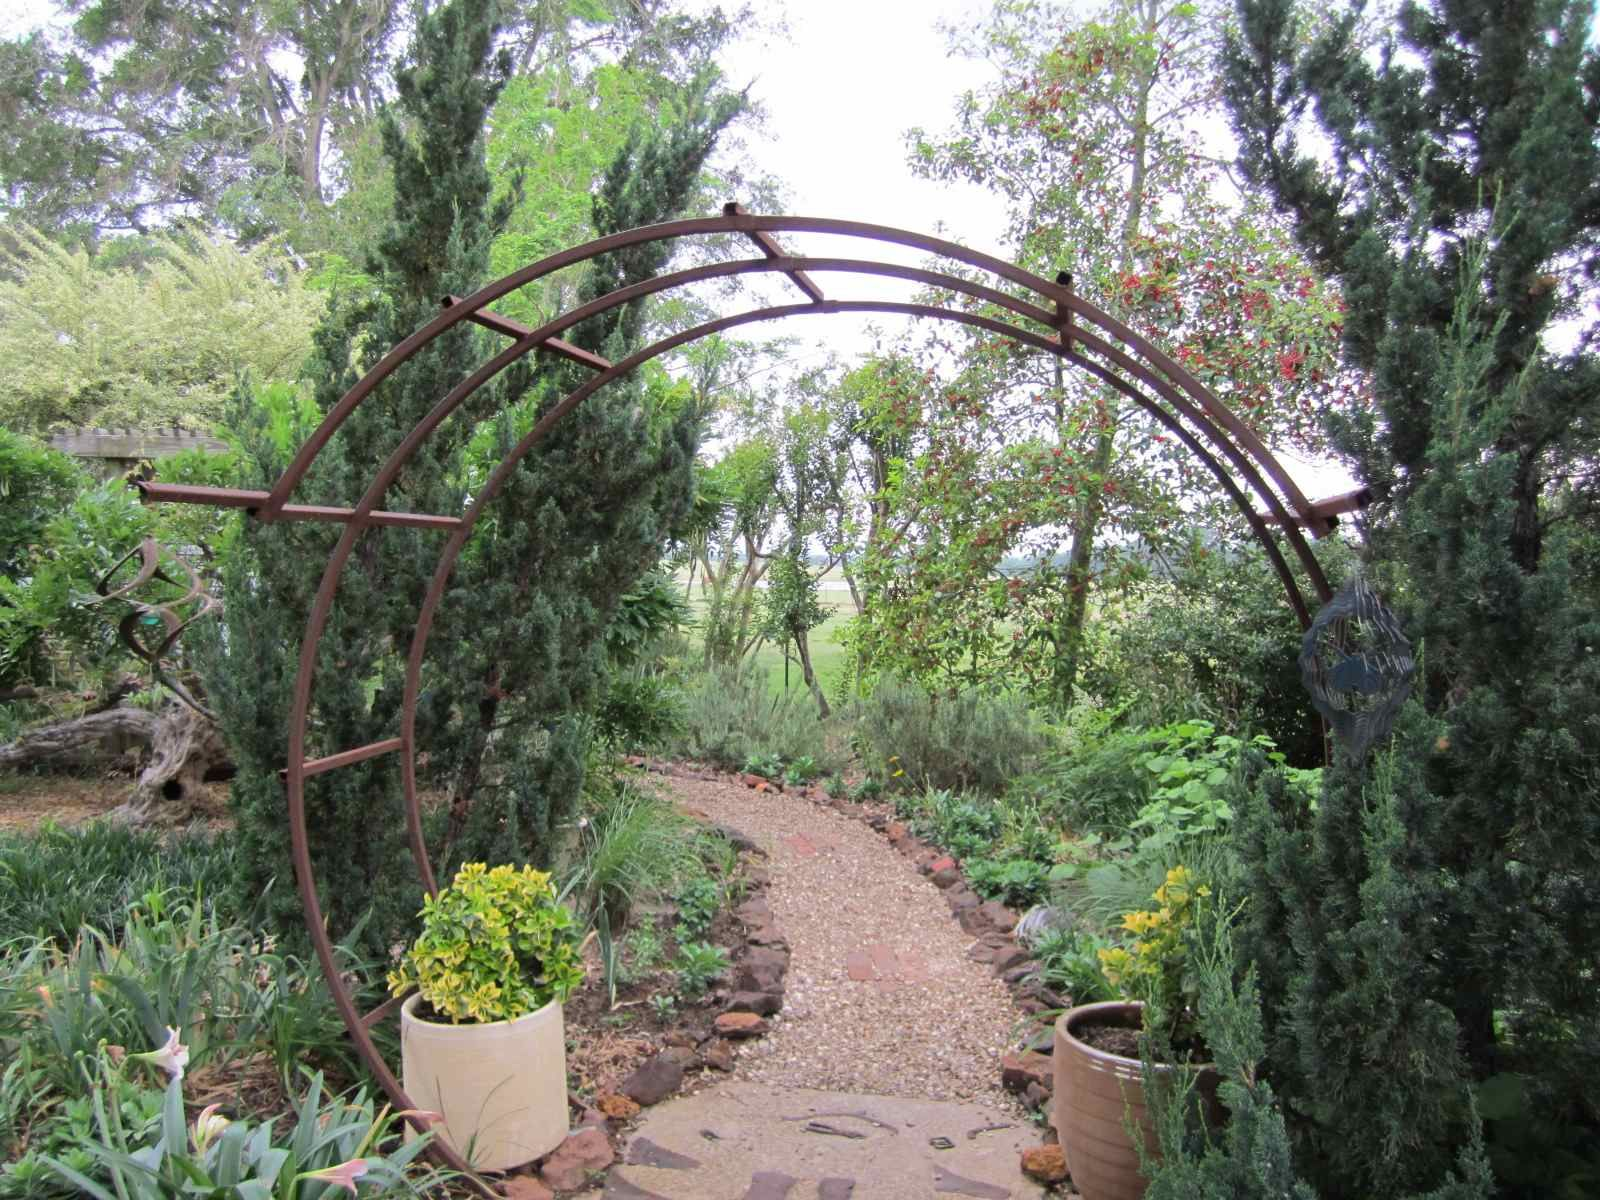 handcrafted slate feeder peanut bird wooden tom garden welland products chambers wellend